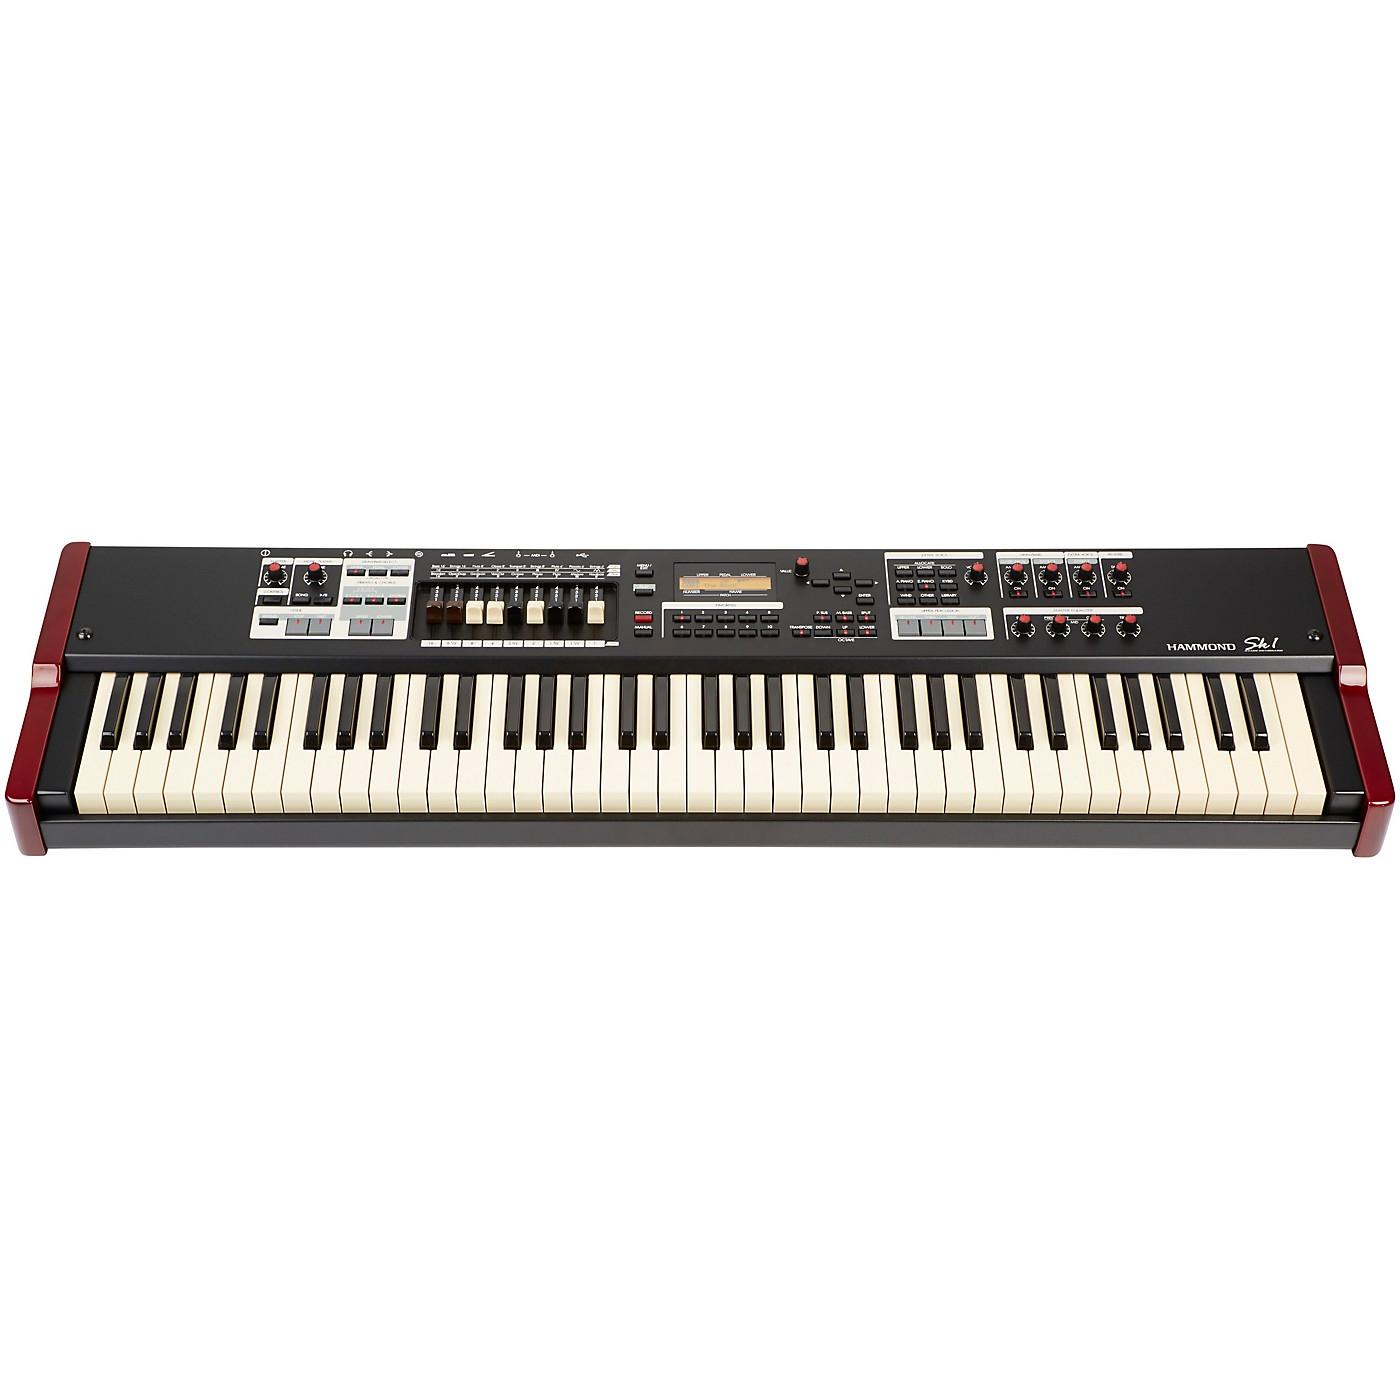 Hammond Sk1-73 73-Key Digital Stage Keyboard and Organ thumbnail